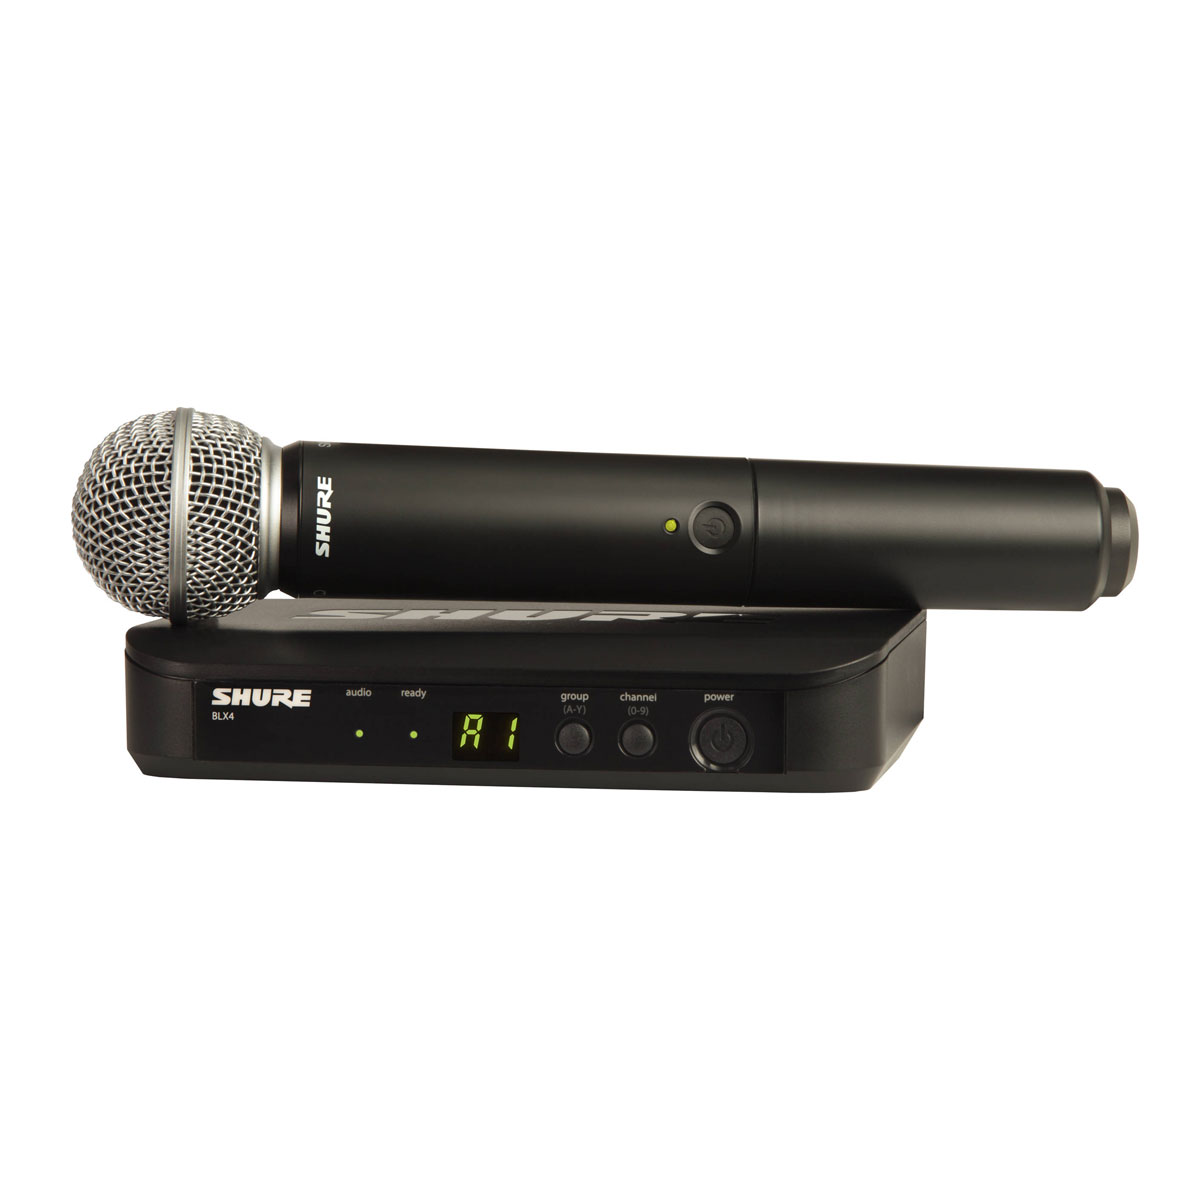 shure blx24 sm58 wireless handheld microphone system. Black Bedroom Furniture Sets. Home Design Ideas